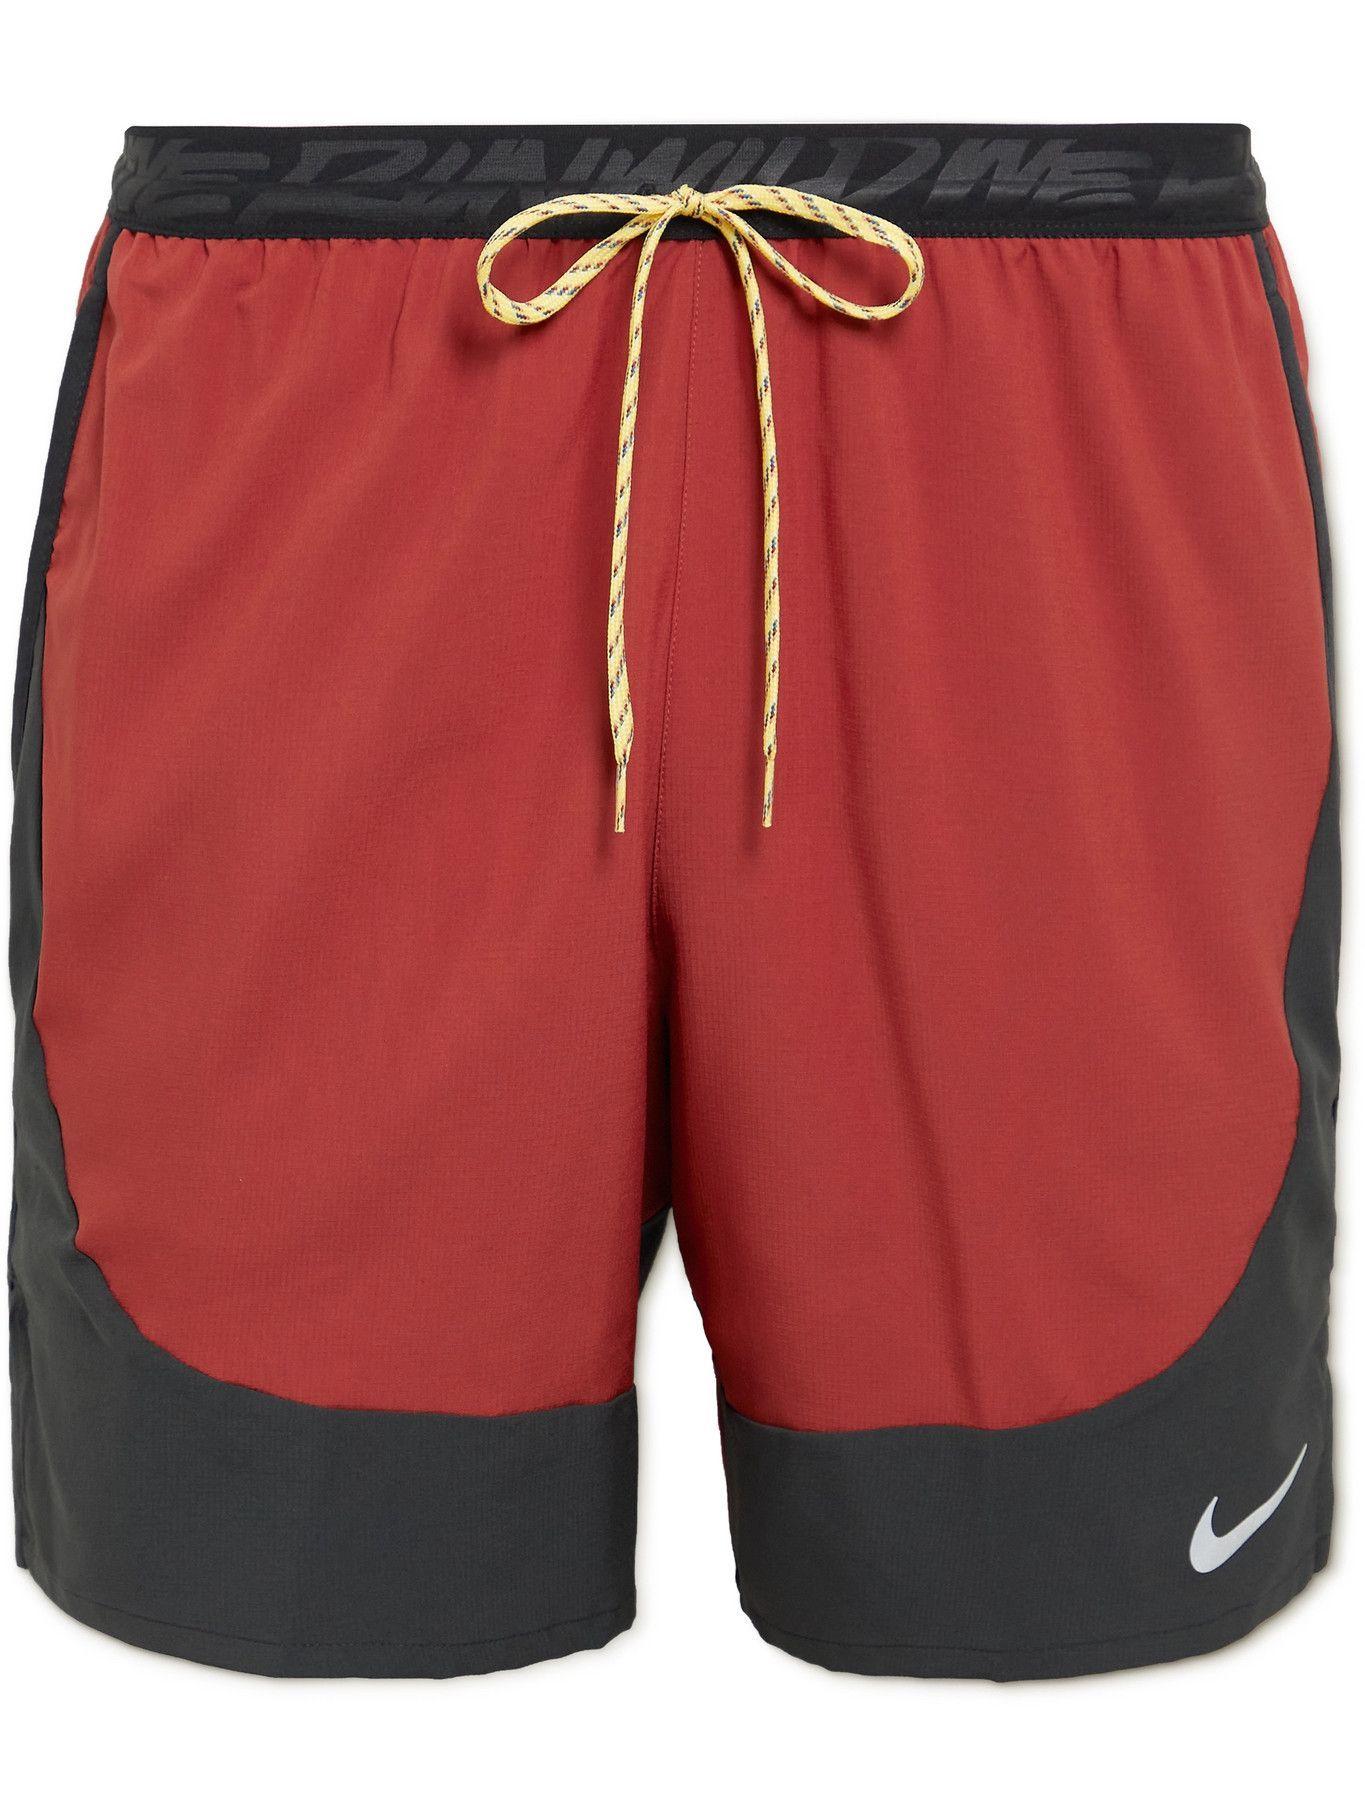 NIKE RUNNING - Flex Stride Dri-FIT Running Shorts - Red